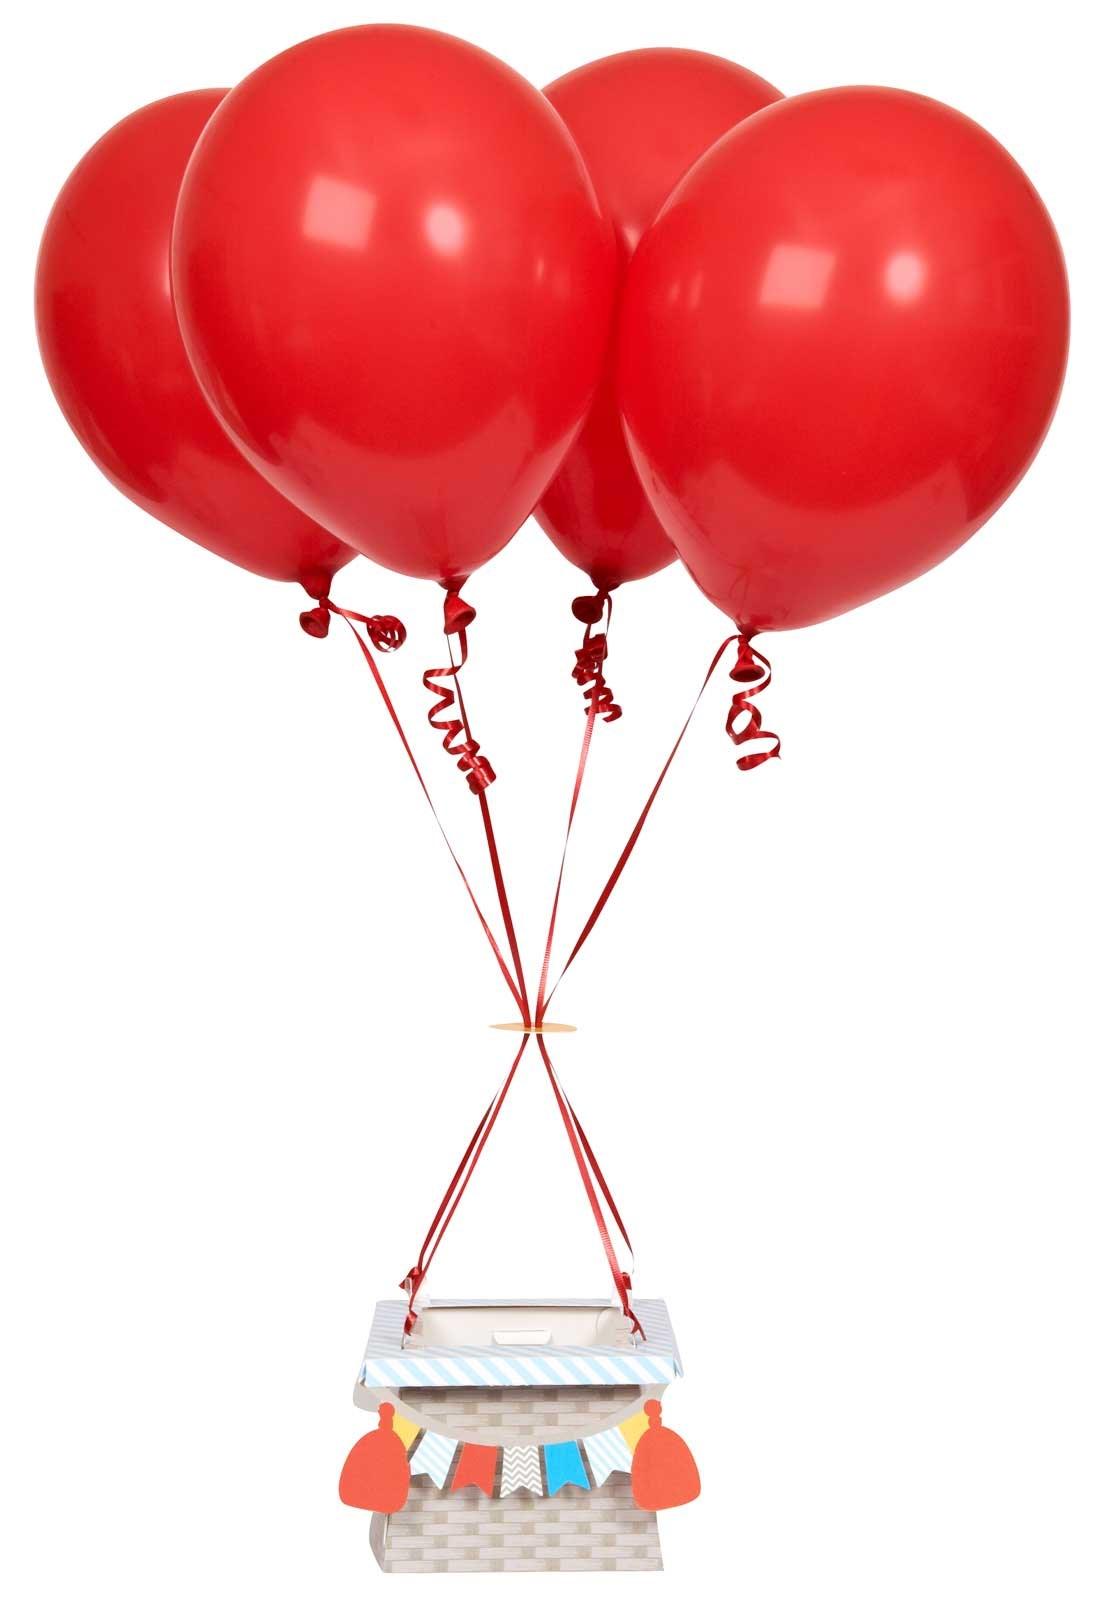 Hot Air Balloon Party Centerpiece BirthdayExpresscom